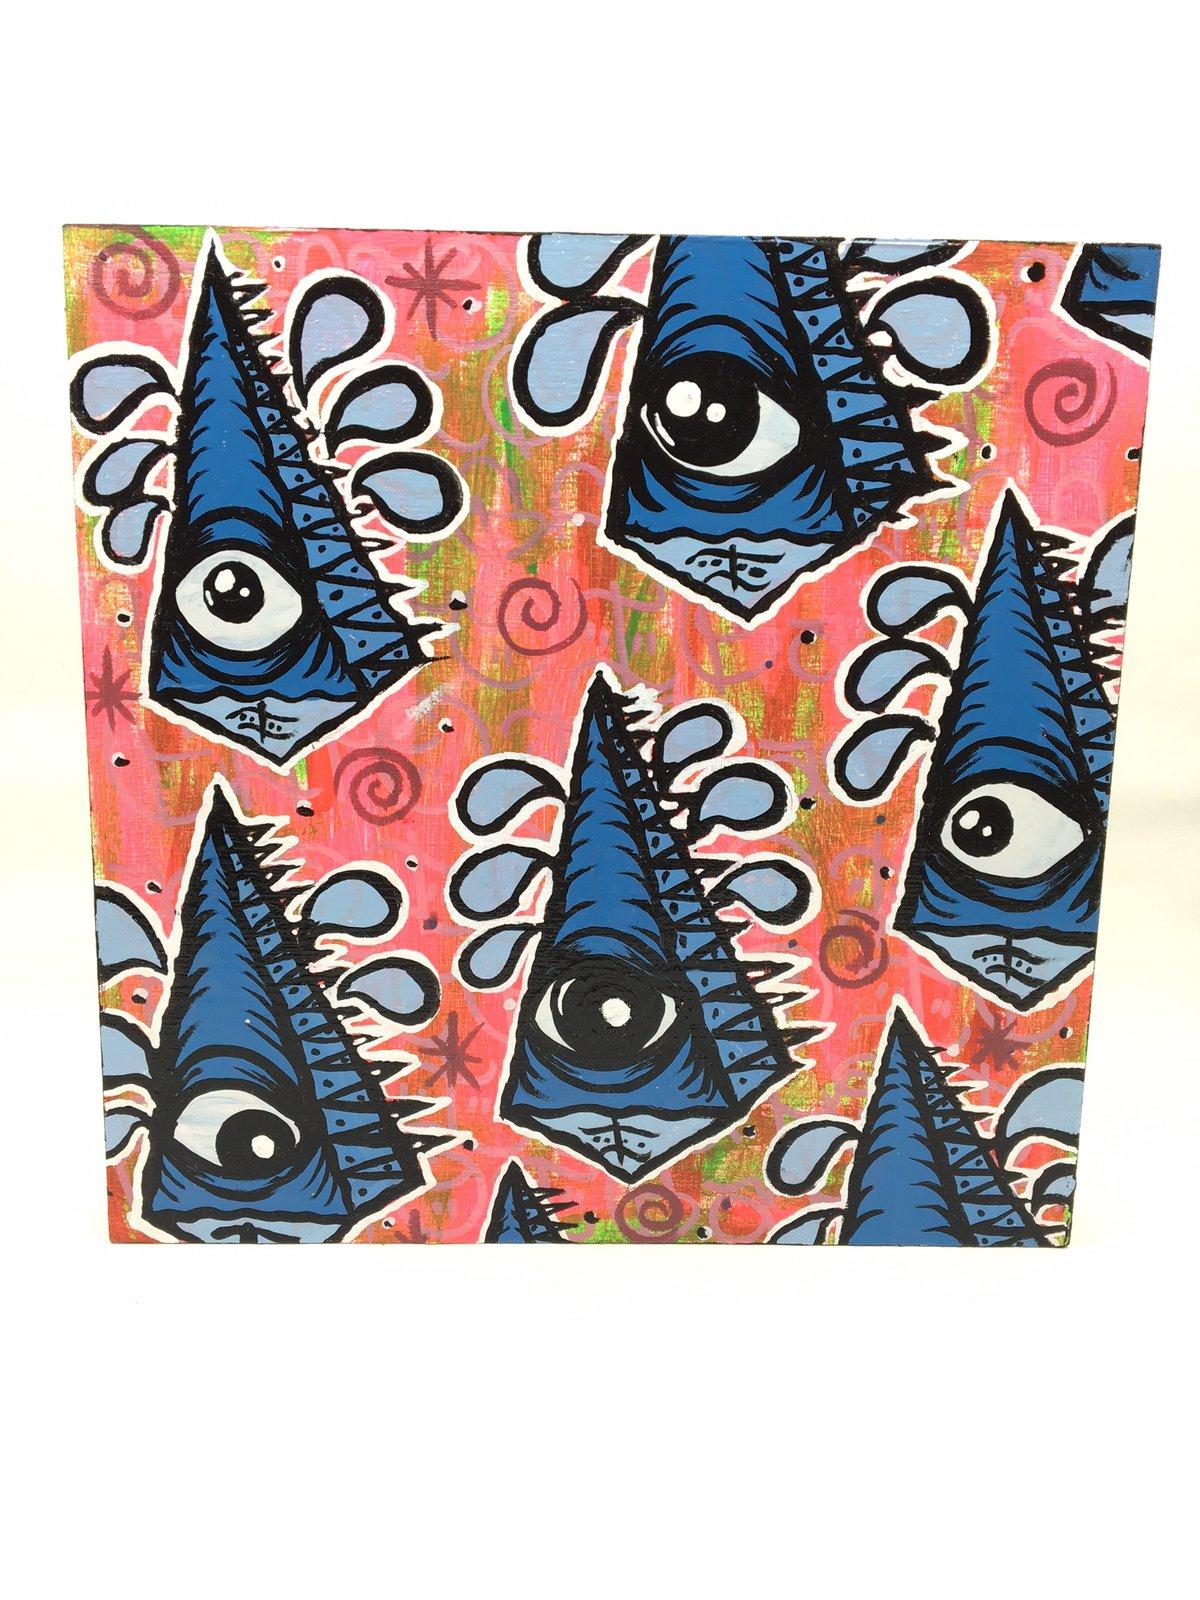 Blue Pyramid Army Painting by Eye Gato